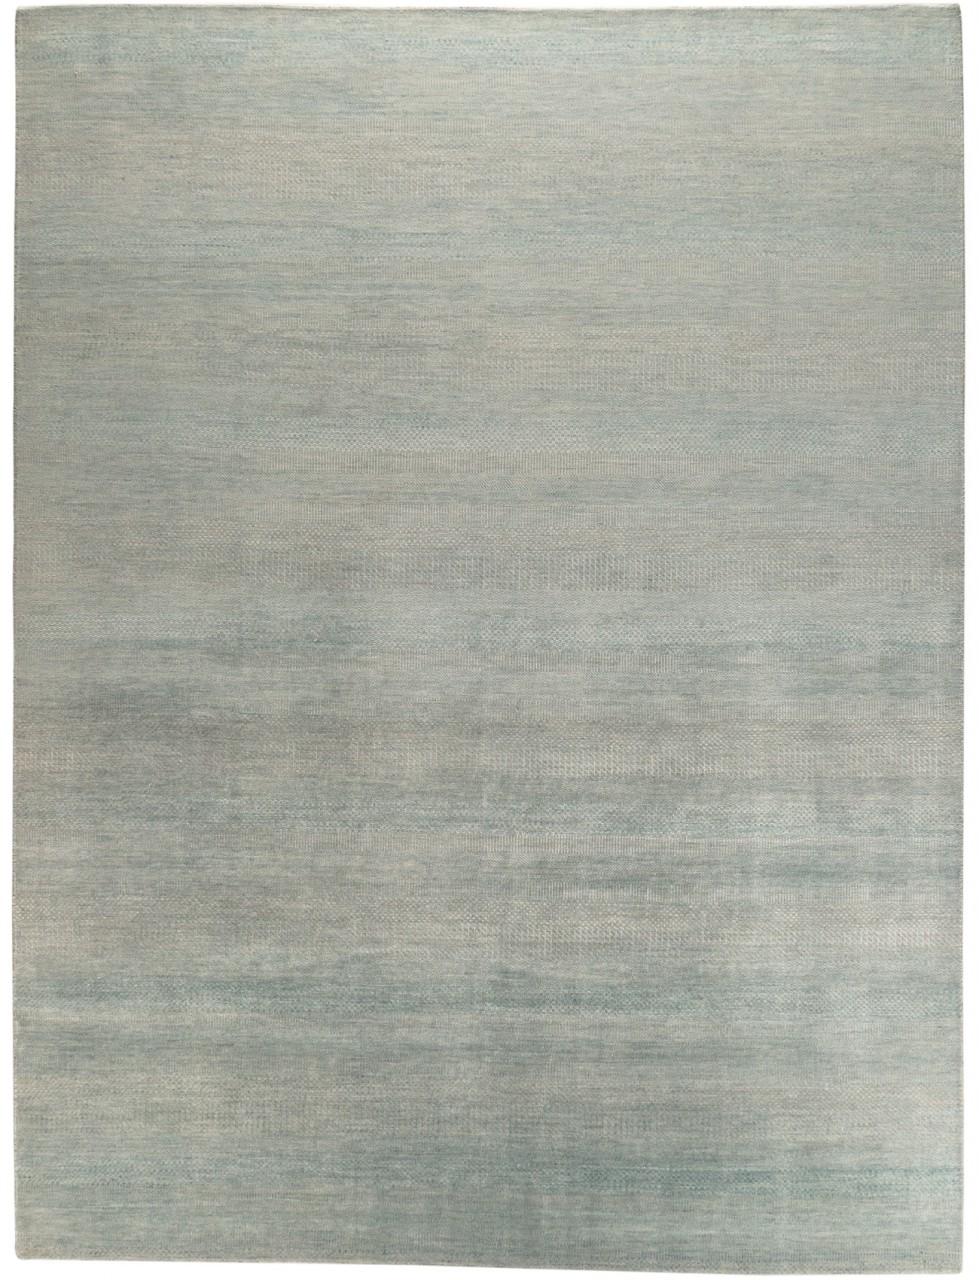 Design-Teppich Haze